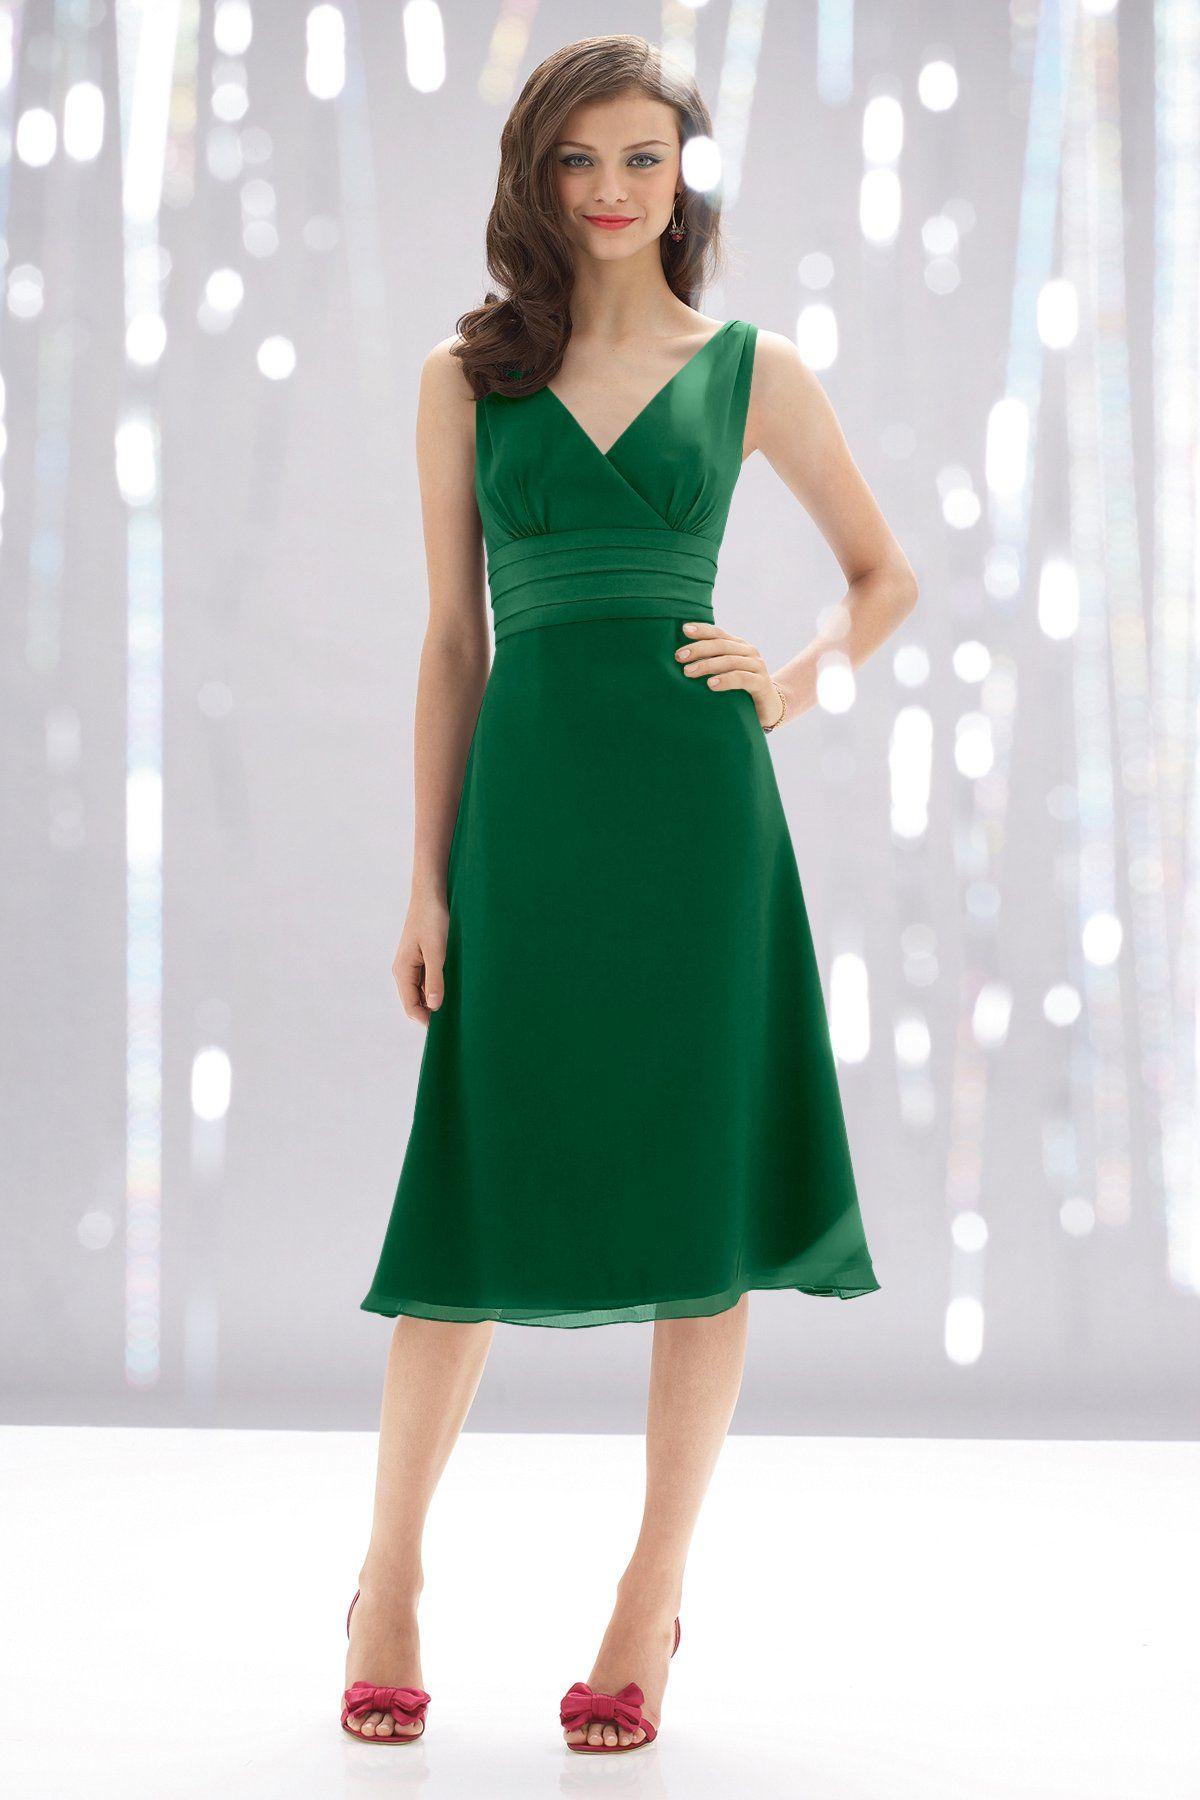 Green long sleeve cocktail dress  Emerald Green Wtoo  Bridesmaid Dress  Weddington Way  Always a